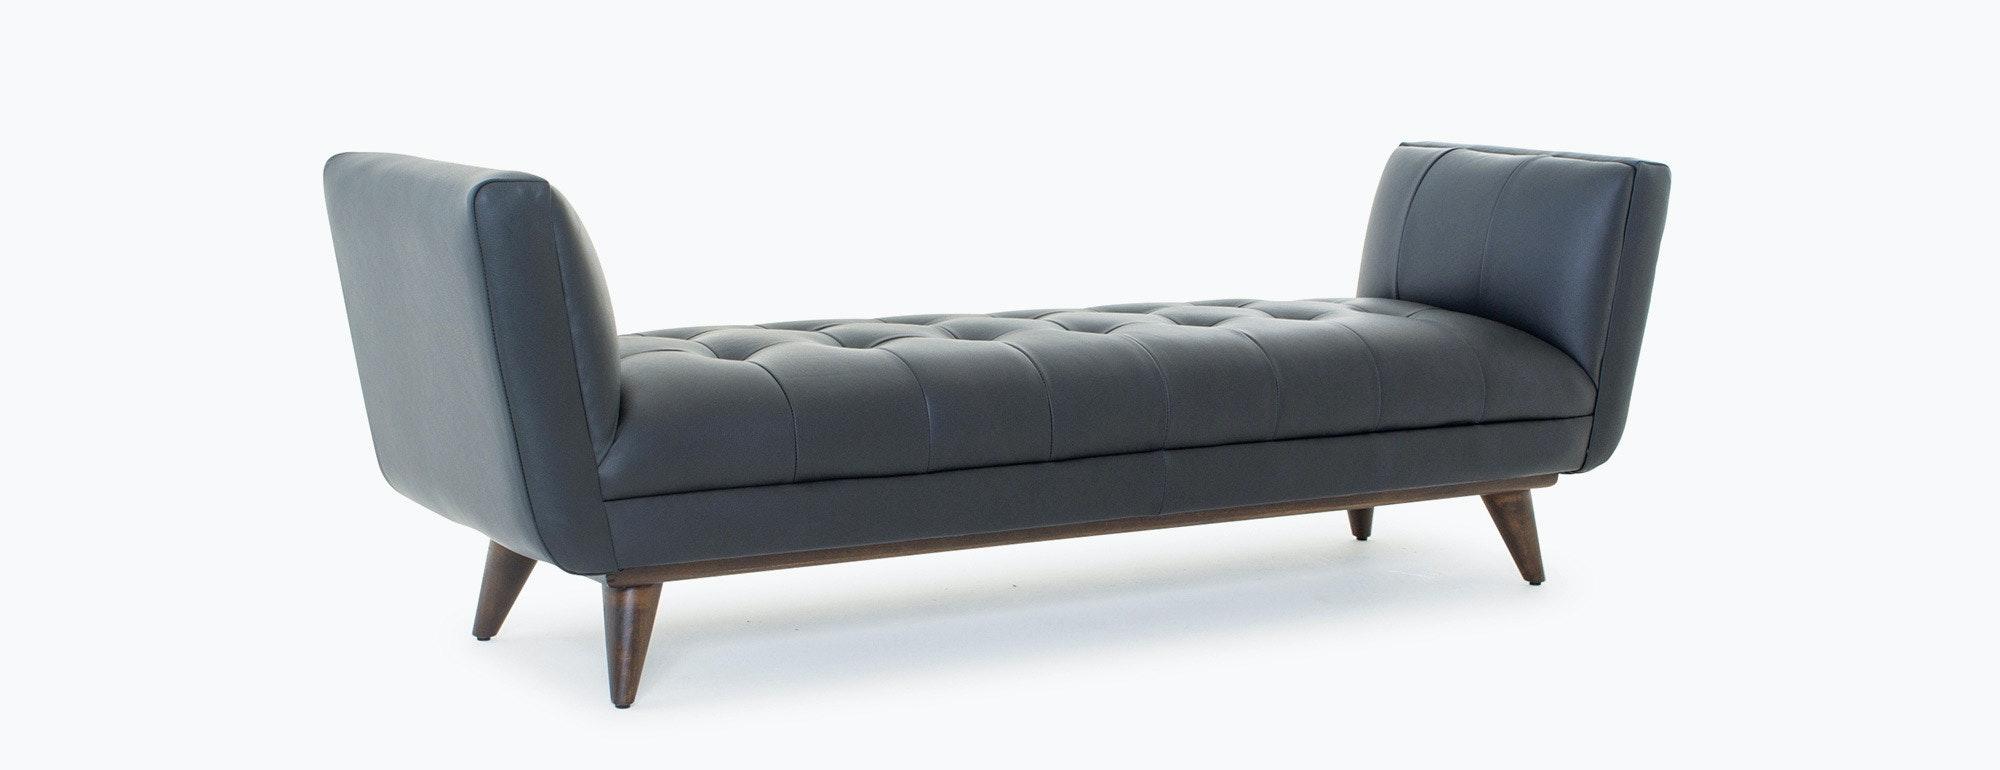 Hughes Leather Bench Joybird